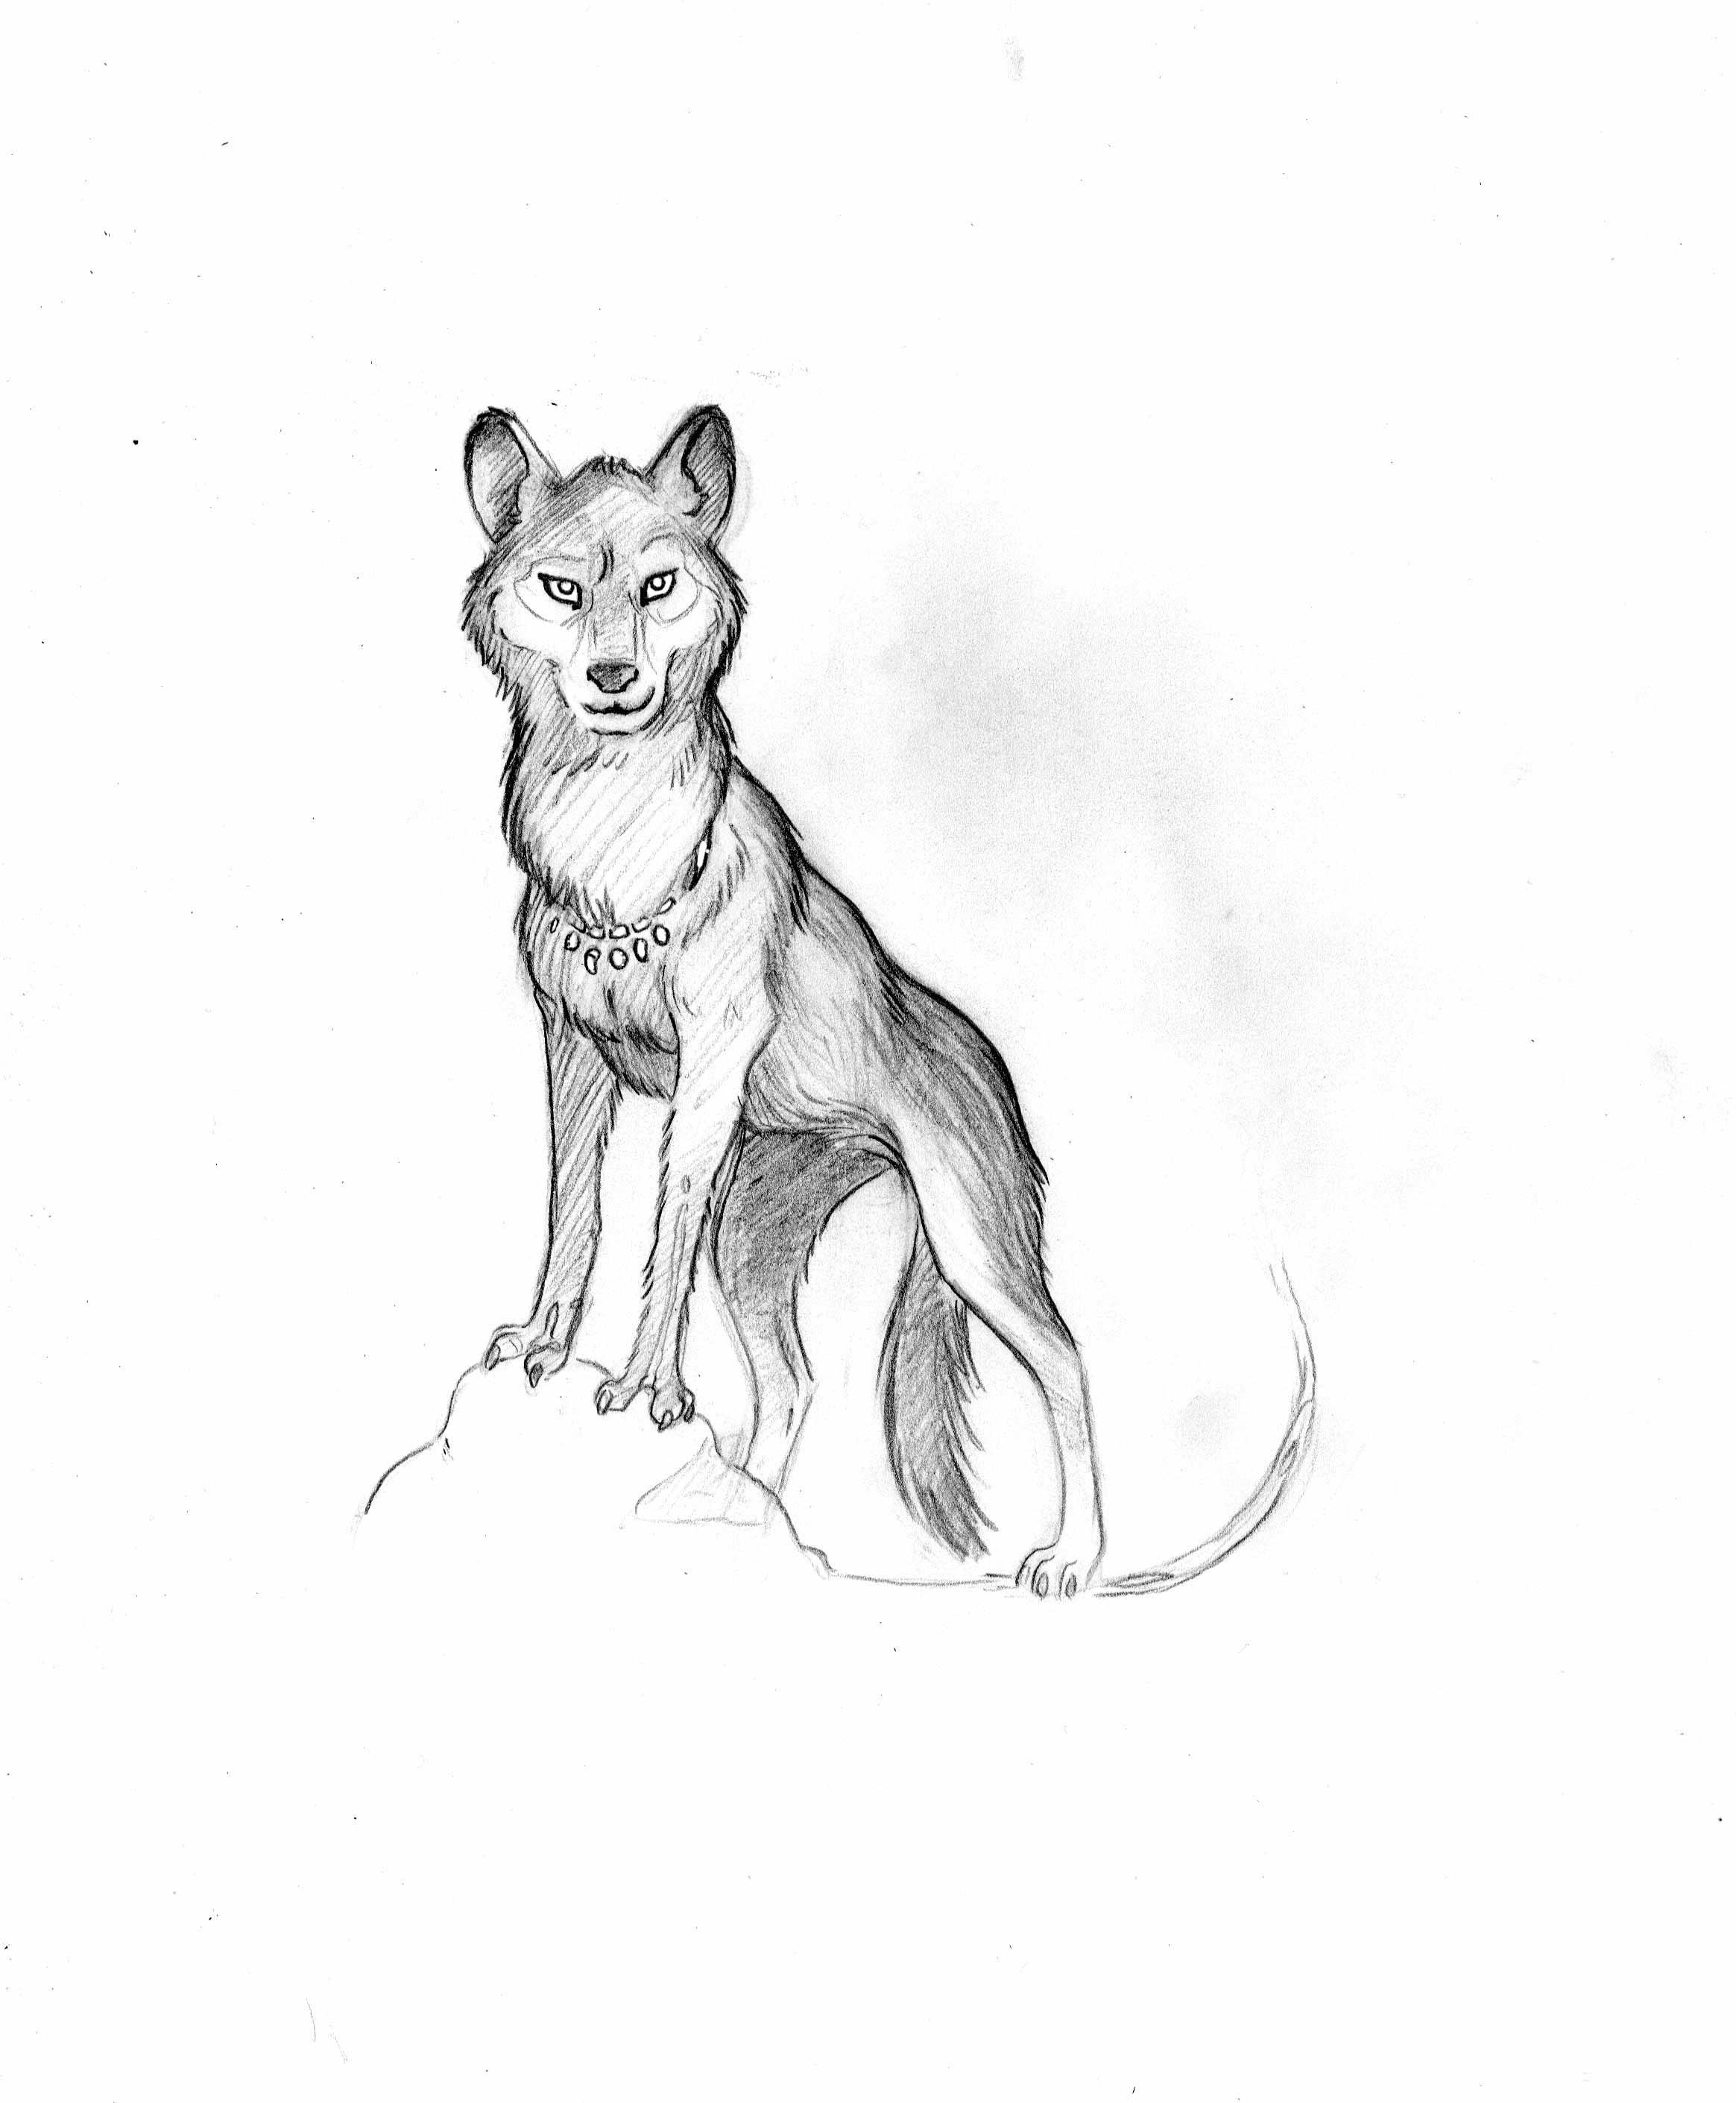 Christopher Garron (as Wolf) Tattoo by tinycoward